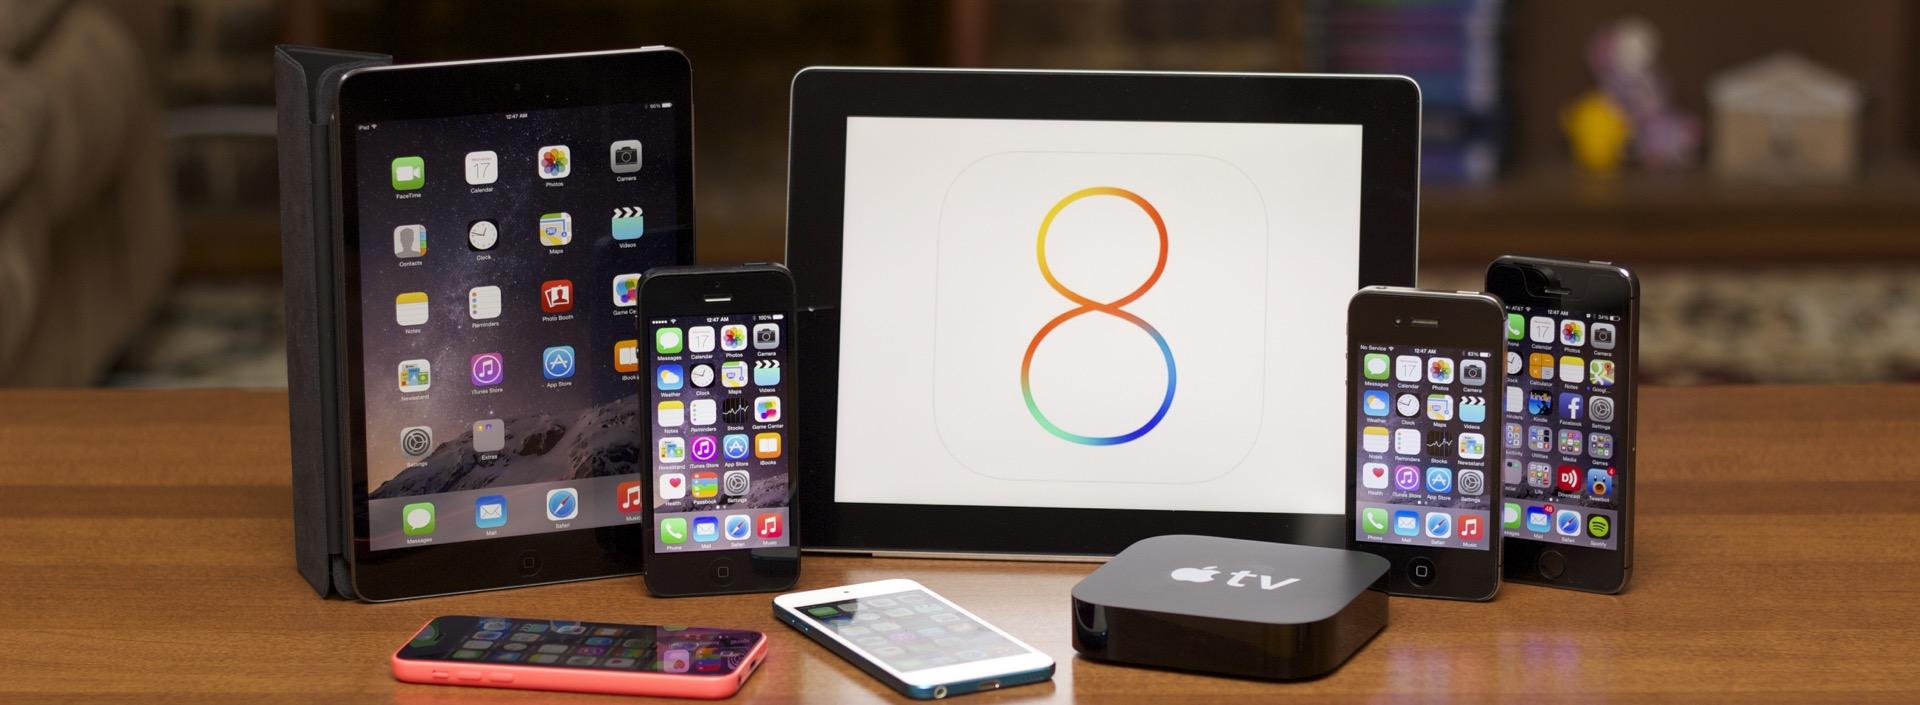 iphone-or-ipad